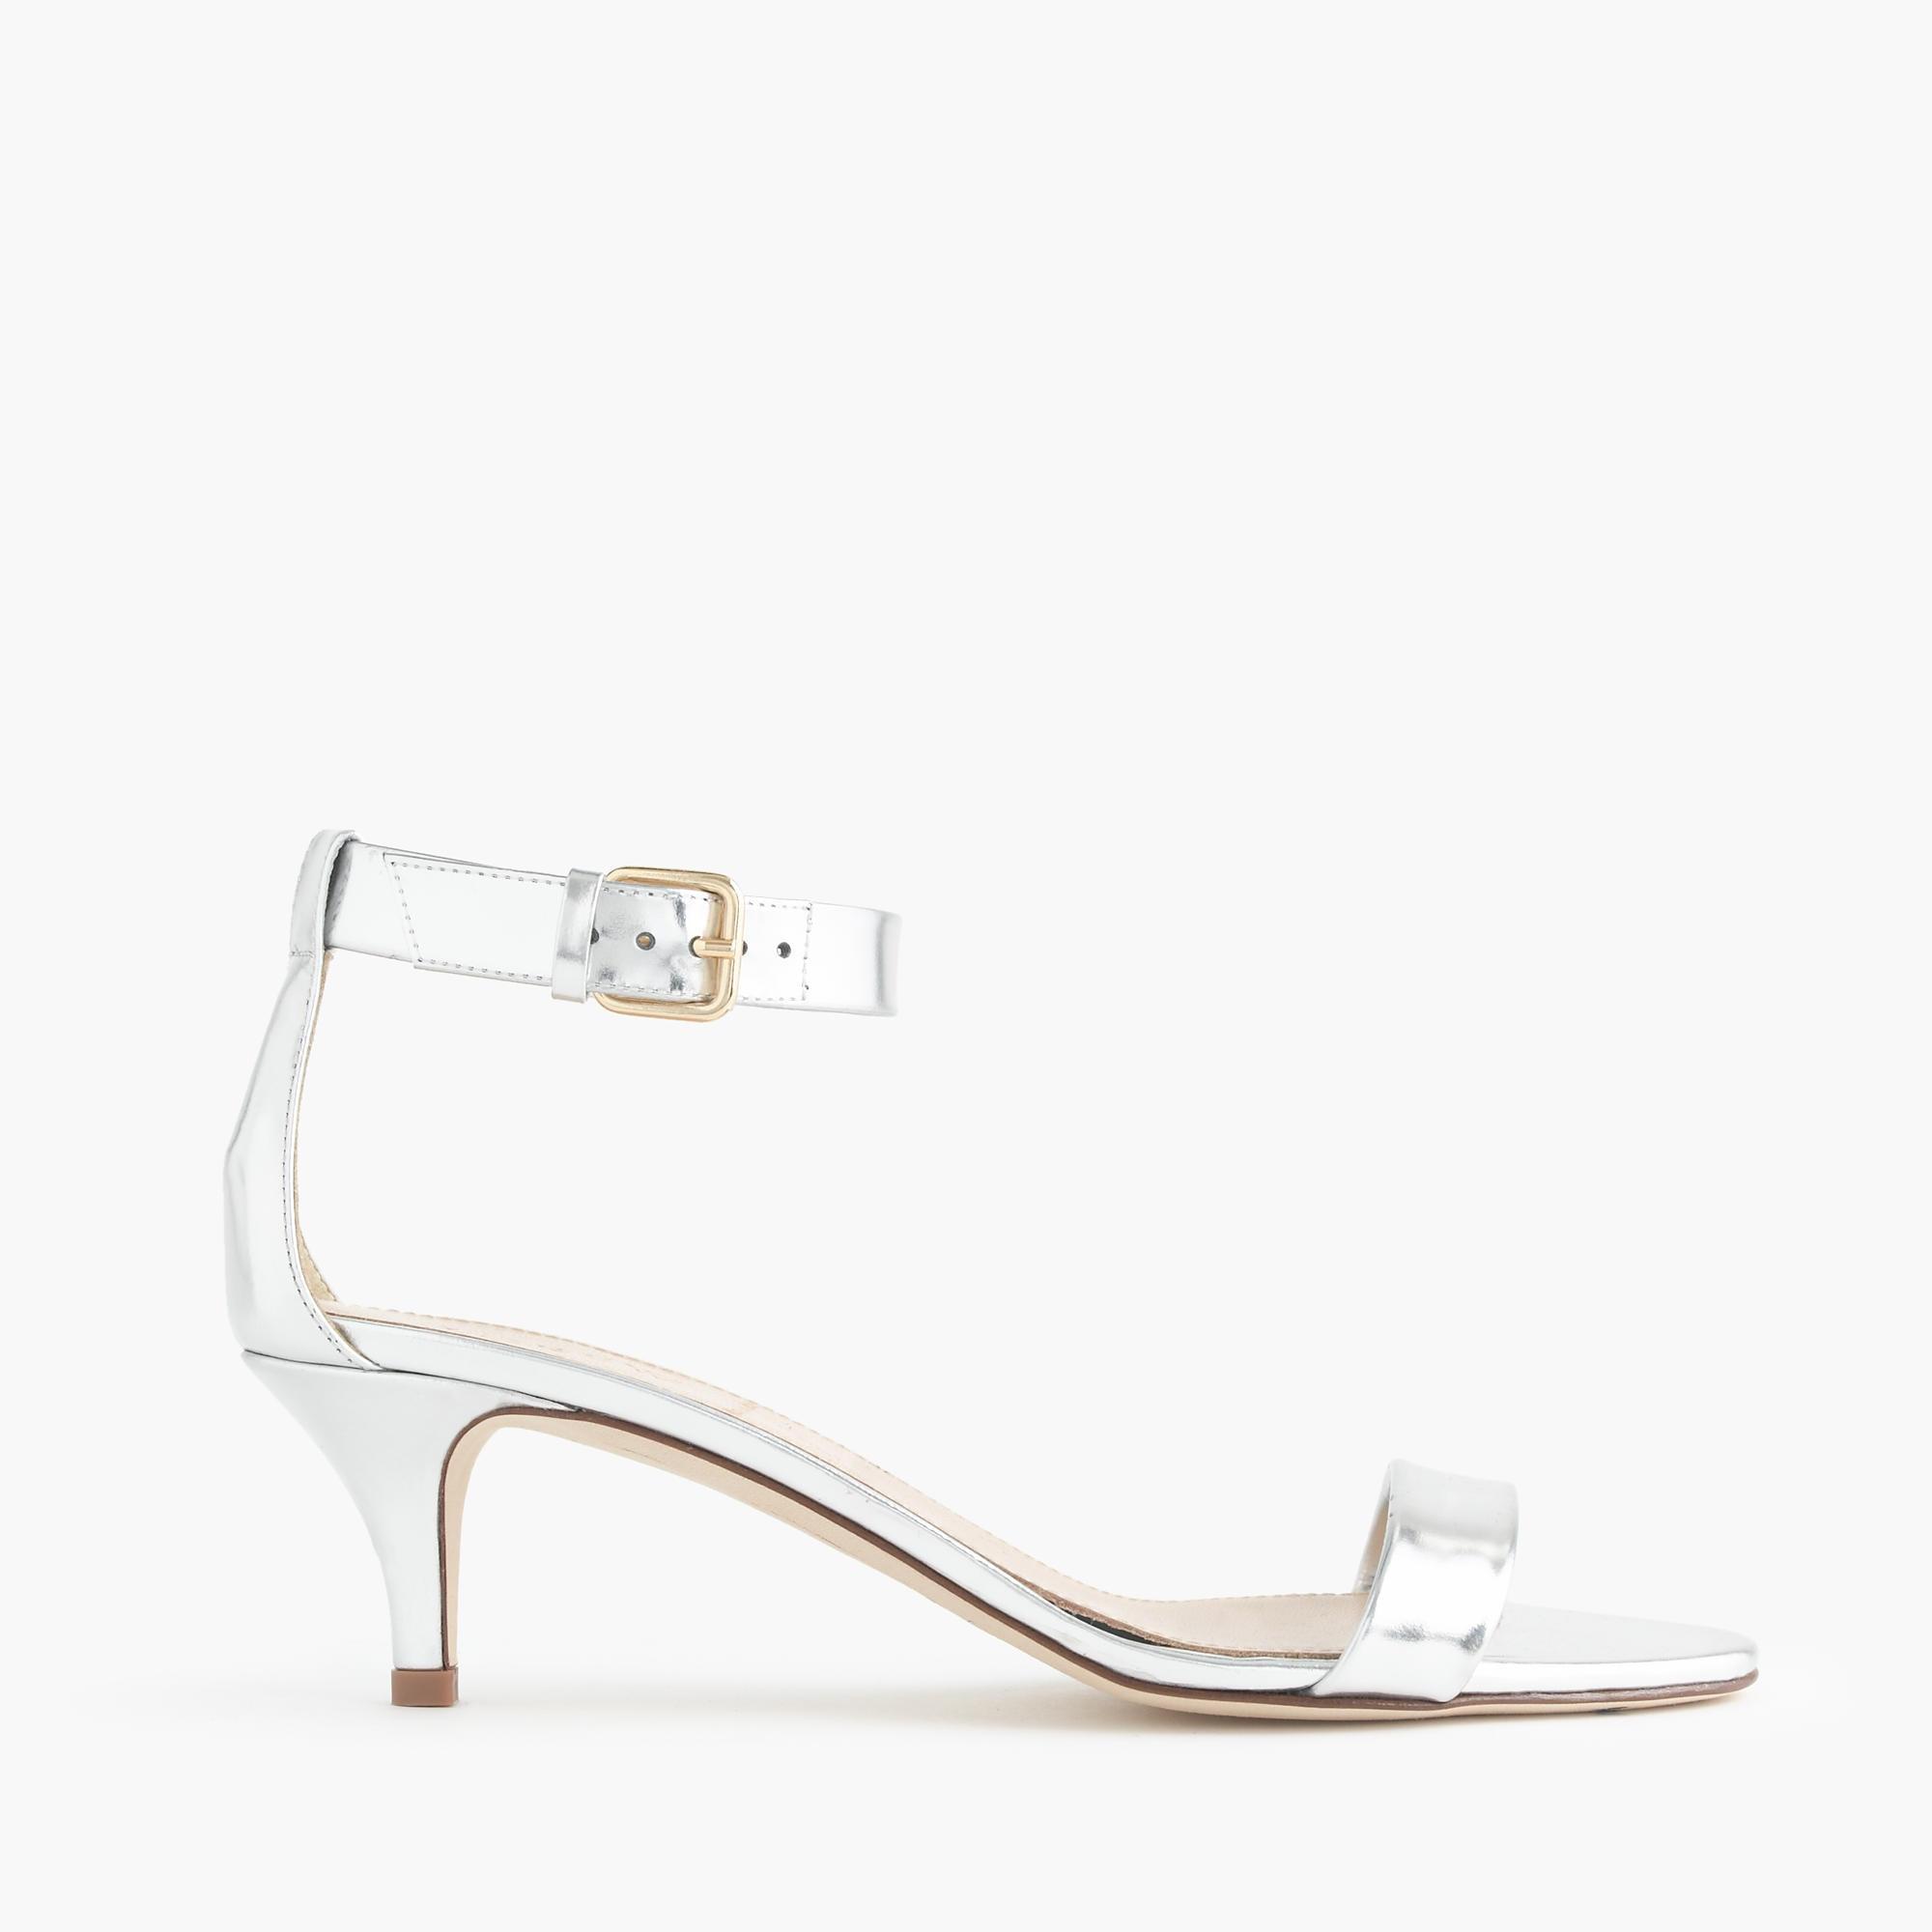 f85aa61f5f41 Lyst - J.Crew Mirror Metallic Kitten-heel Sandals in Metallic